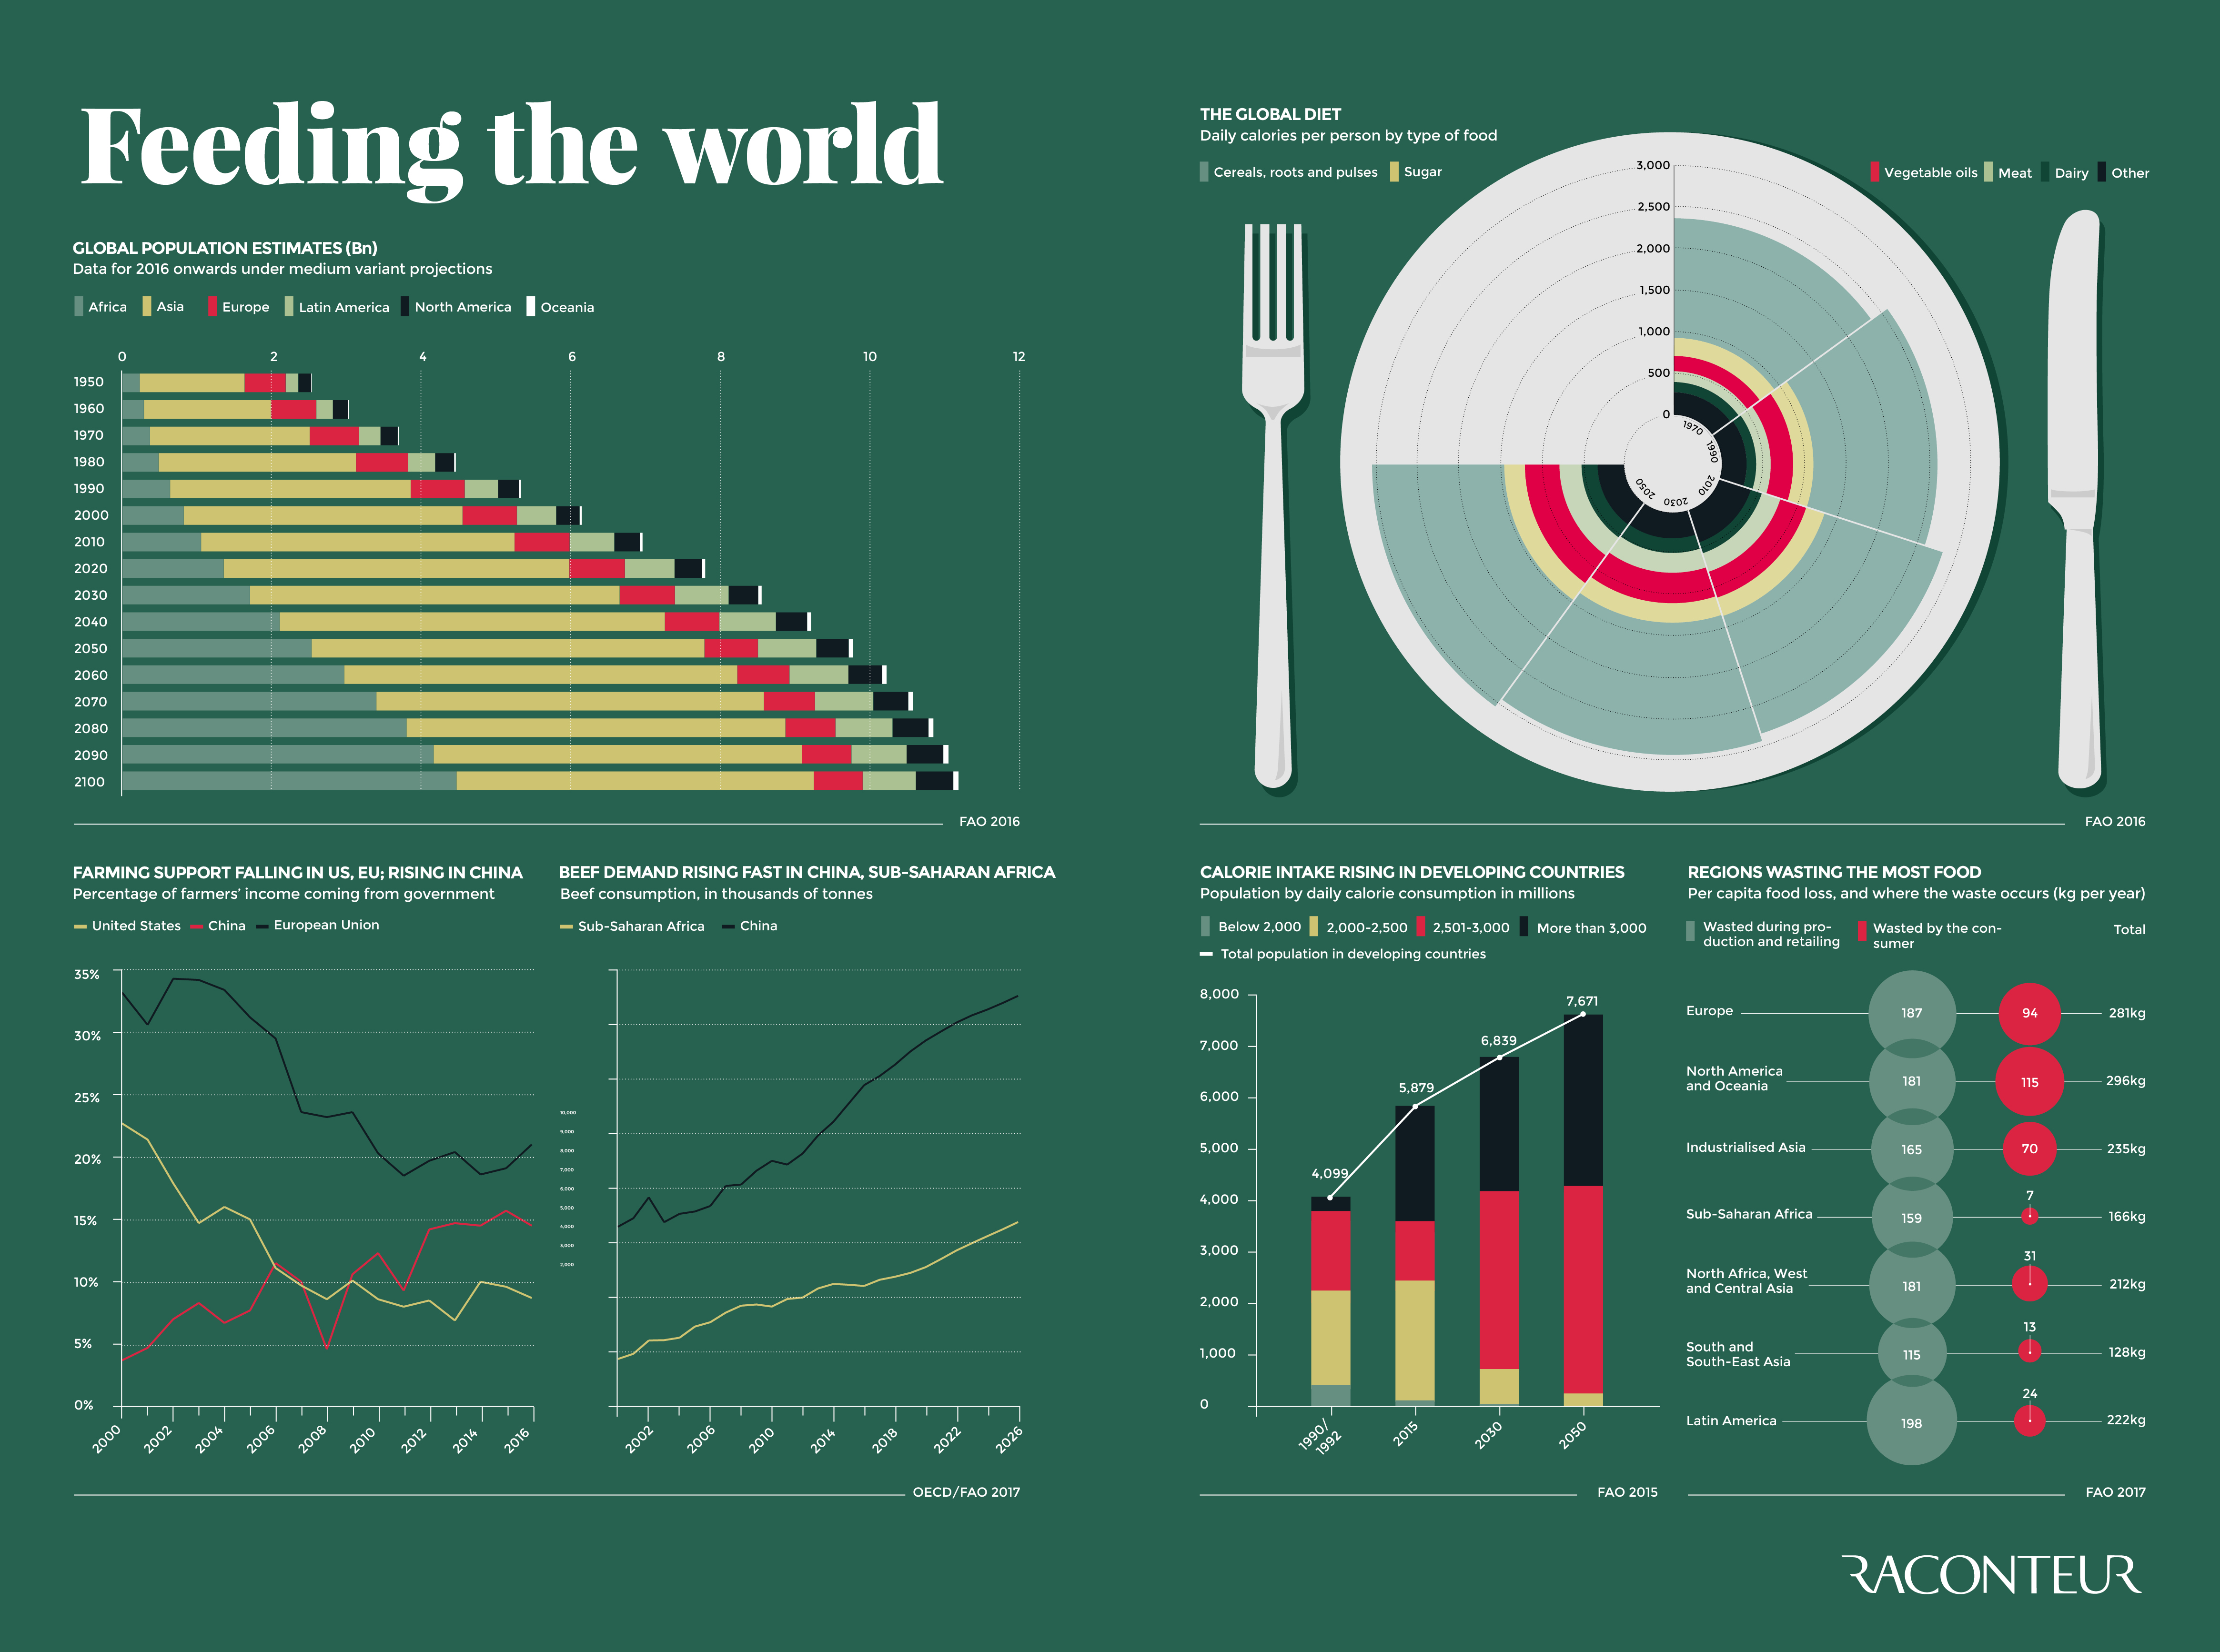 Feeding the world infographic